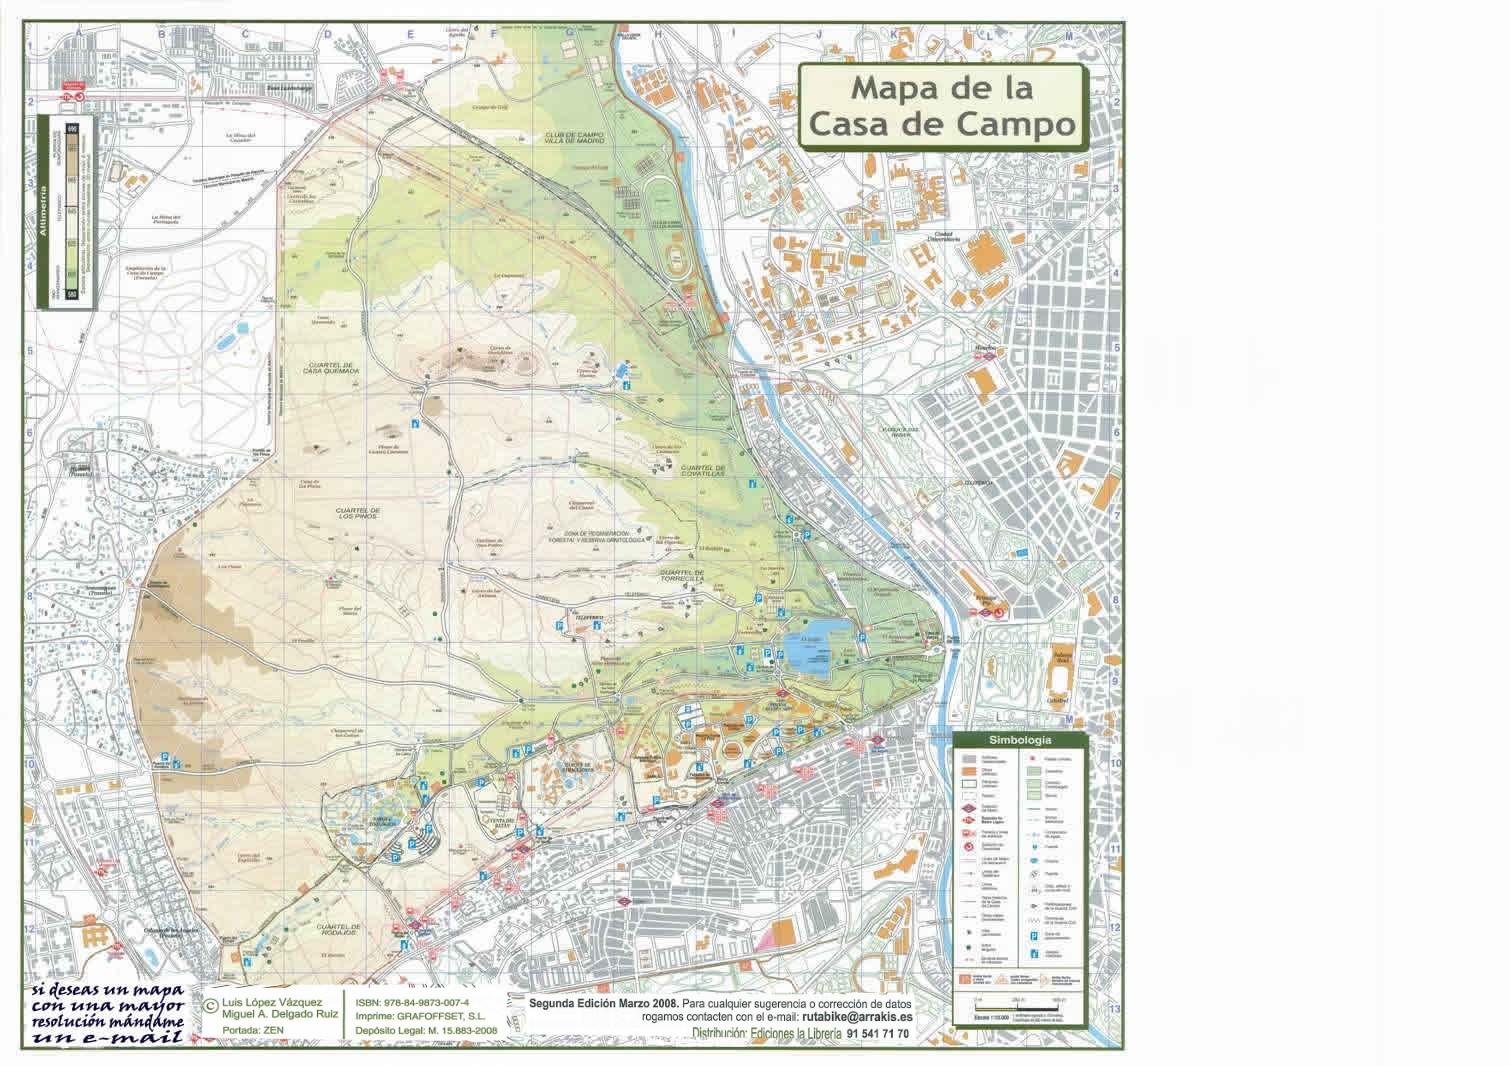 Contenido - Mapa De La Casa De Campo - Mimasku.com